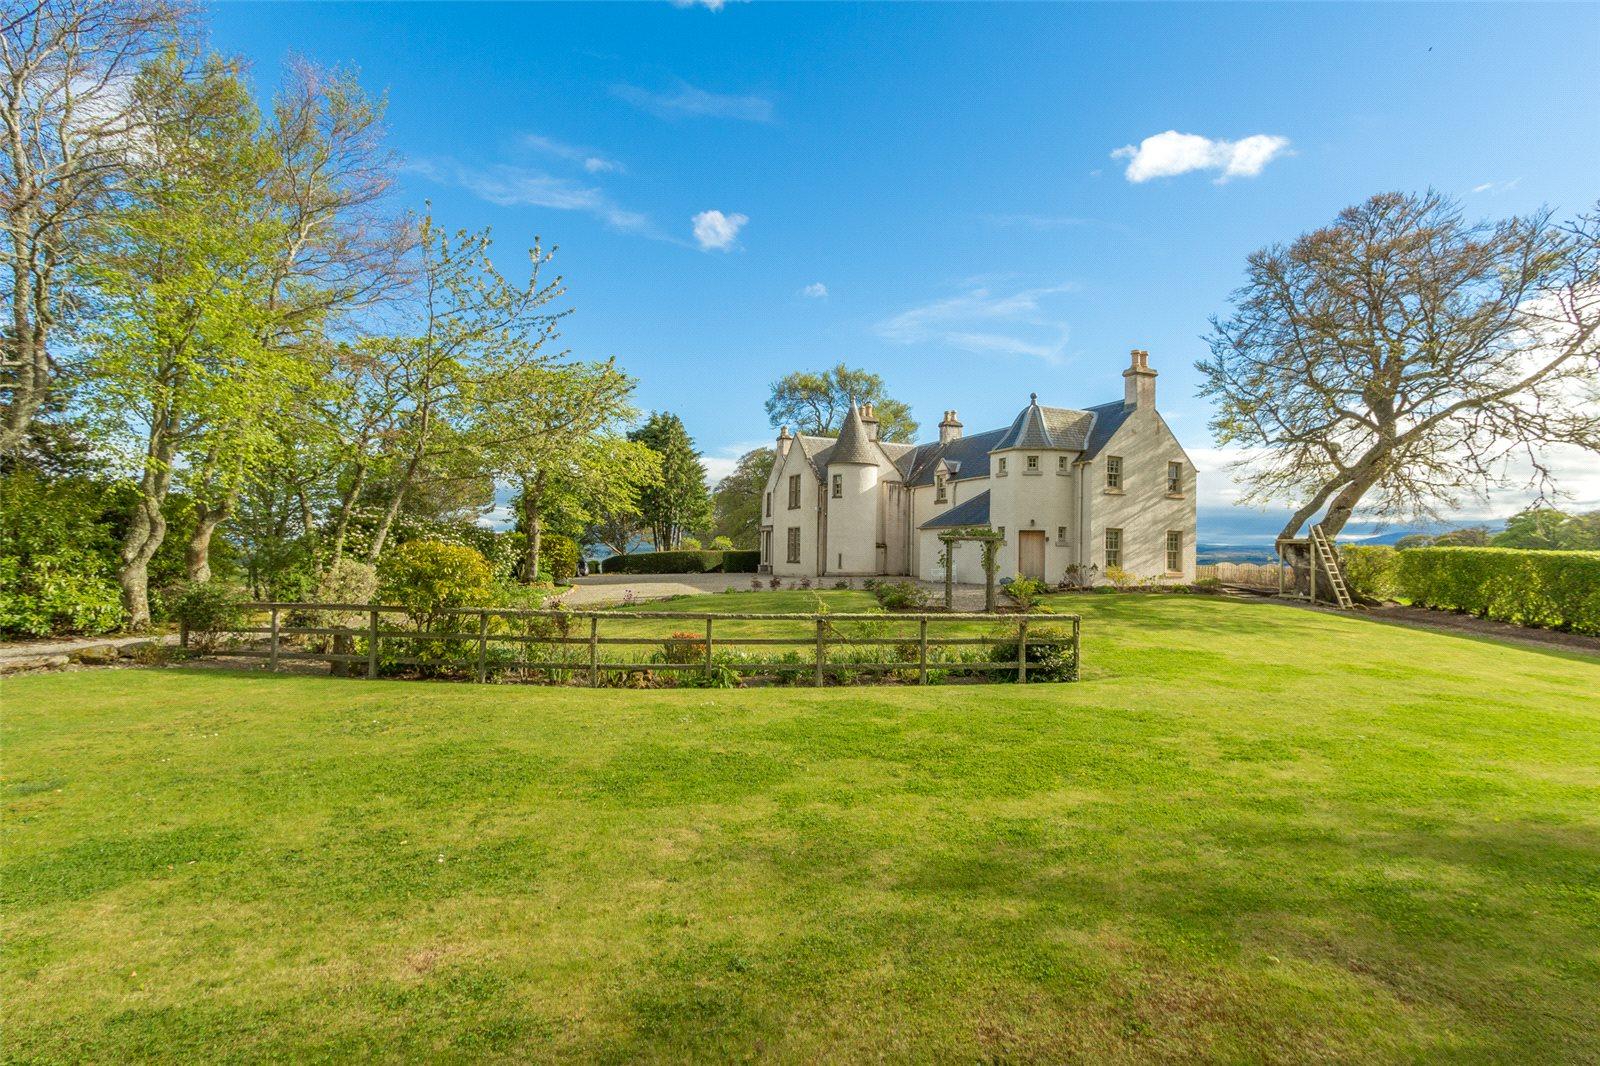 Single Family Home for Sale at Clashmore, Dornoch, Sutherland, IV25 Scotland